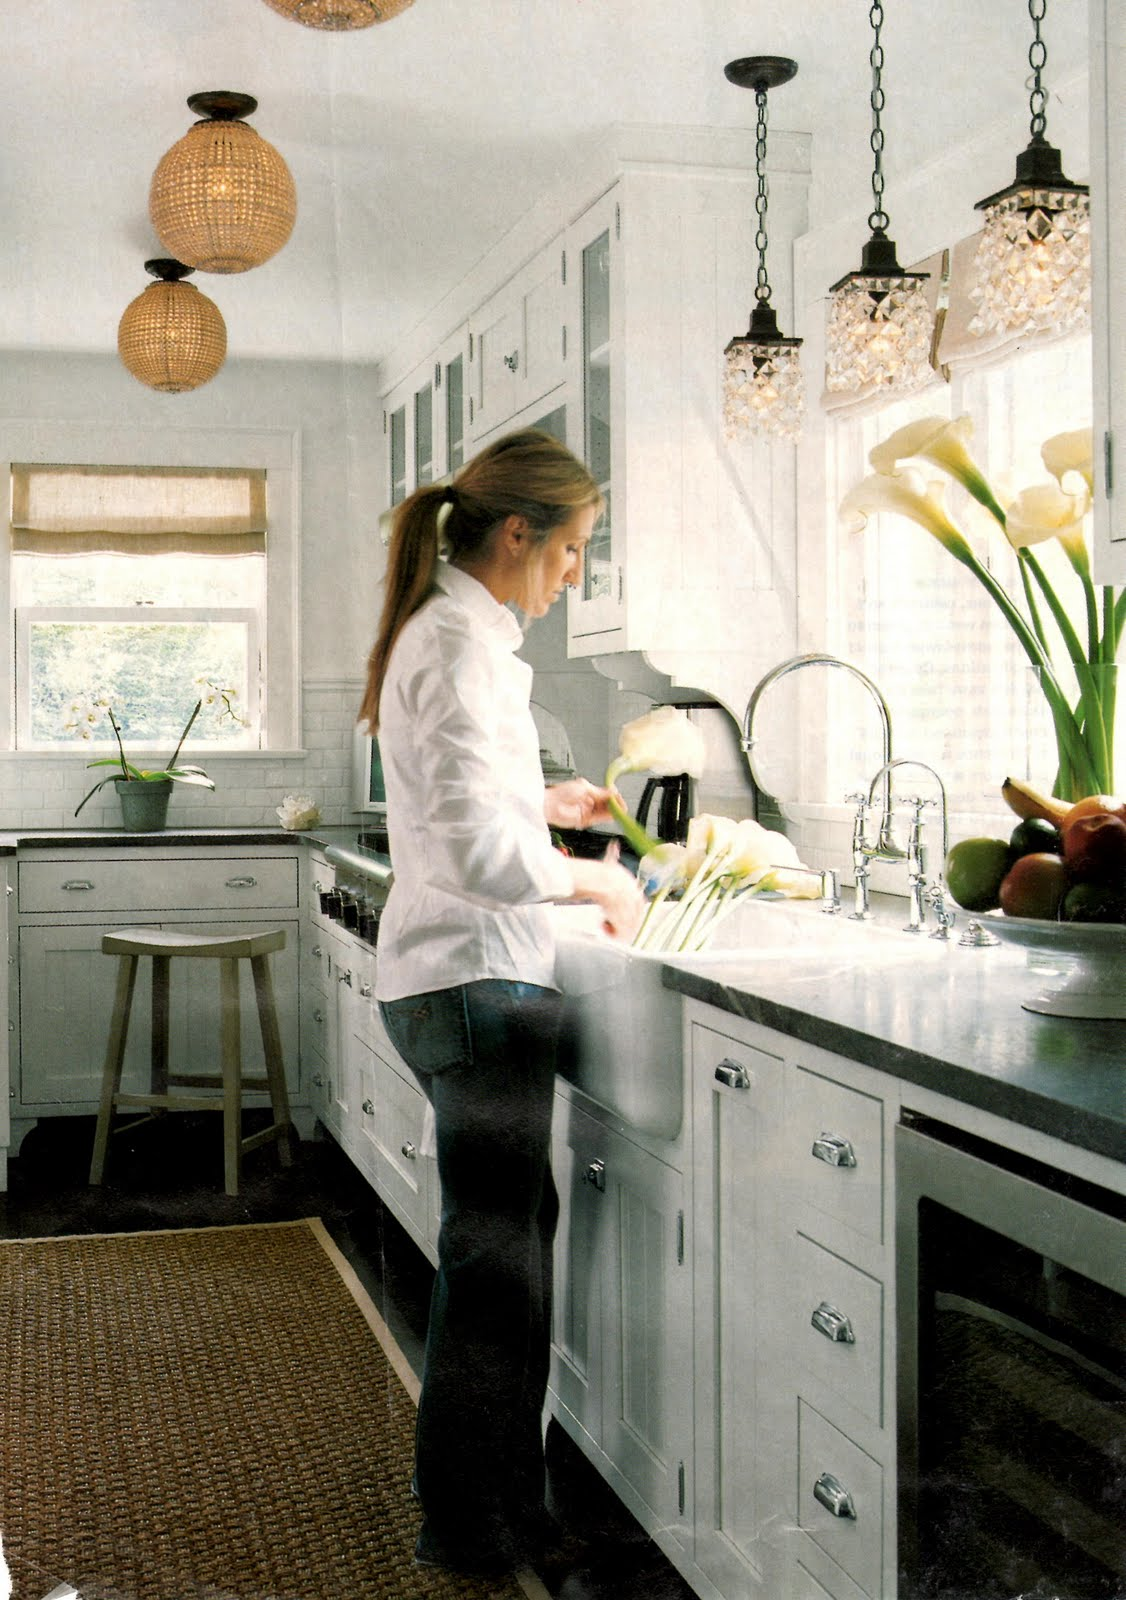 over the sink lighting. Pendant Lighting Over Sink. Pendants The Kitchen Sink Design  Manifestdesign Manifest S